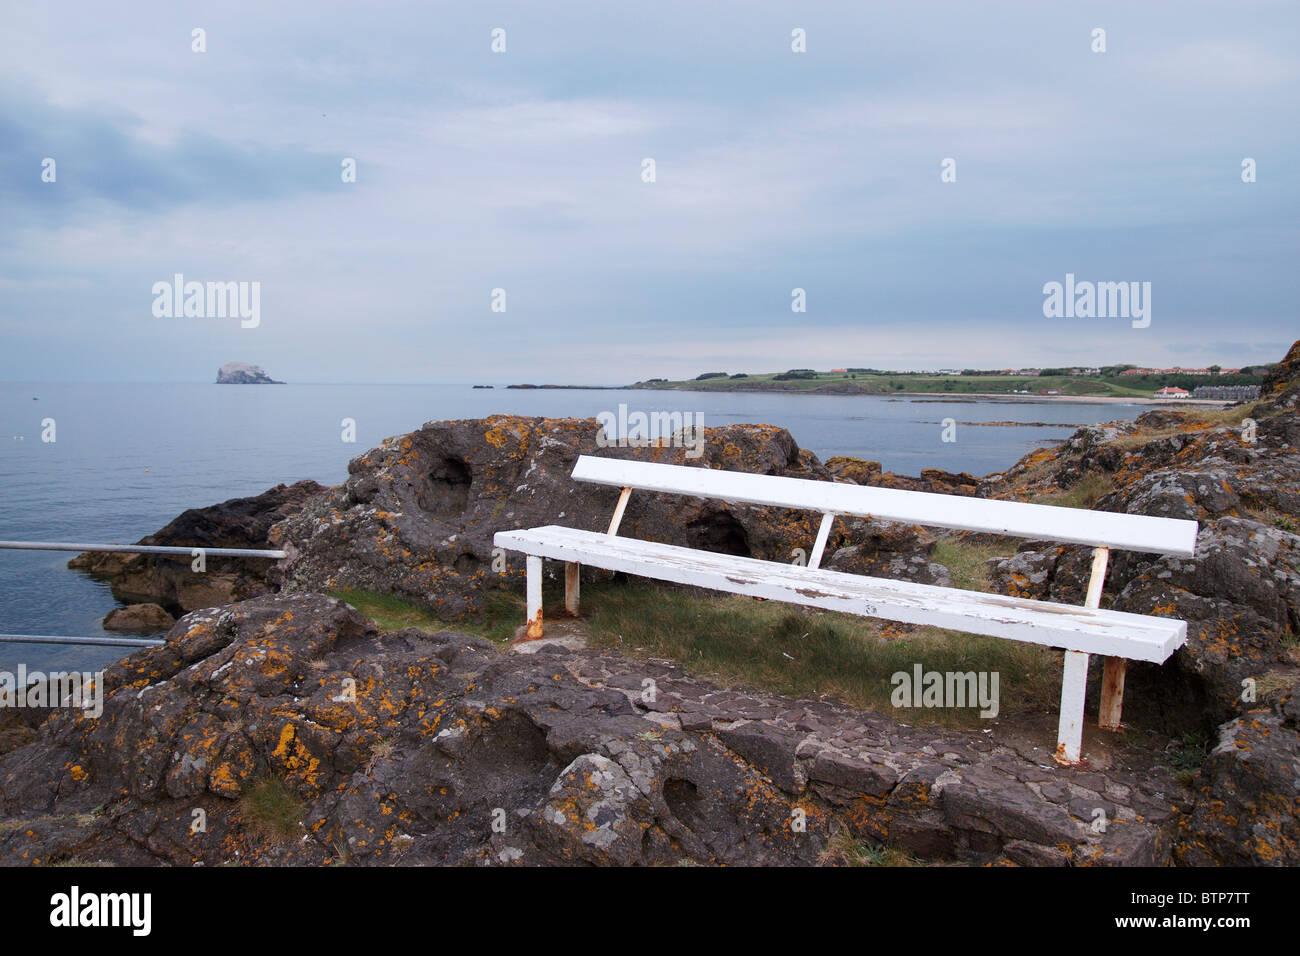 Scotland, North Berwick, Empty bench at seashore - Stock Image